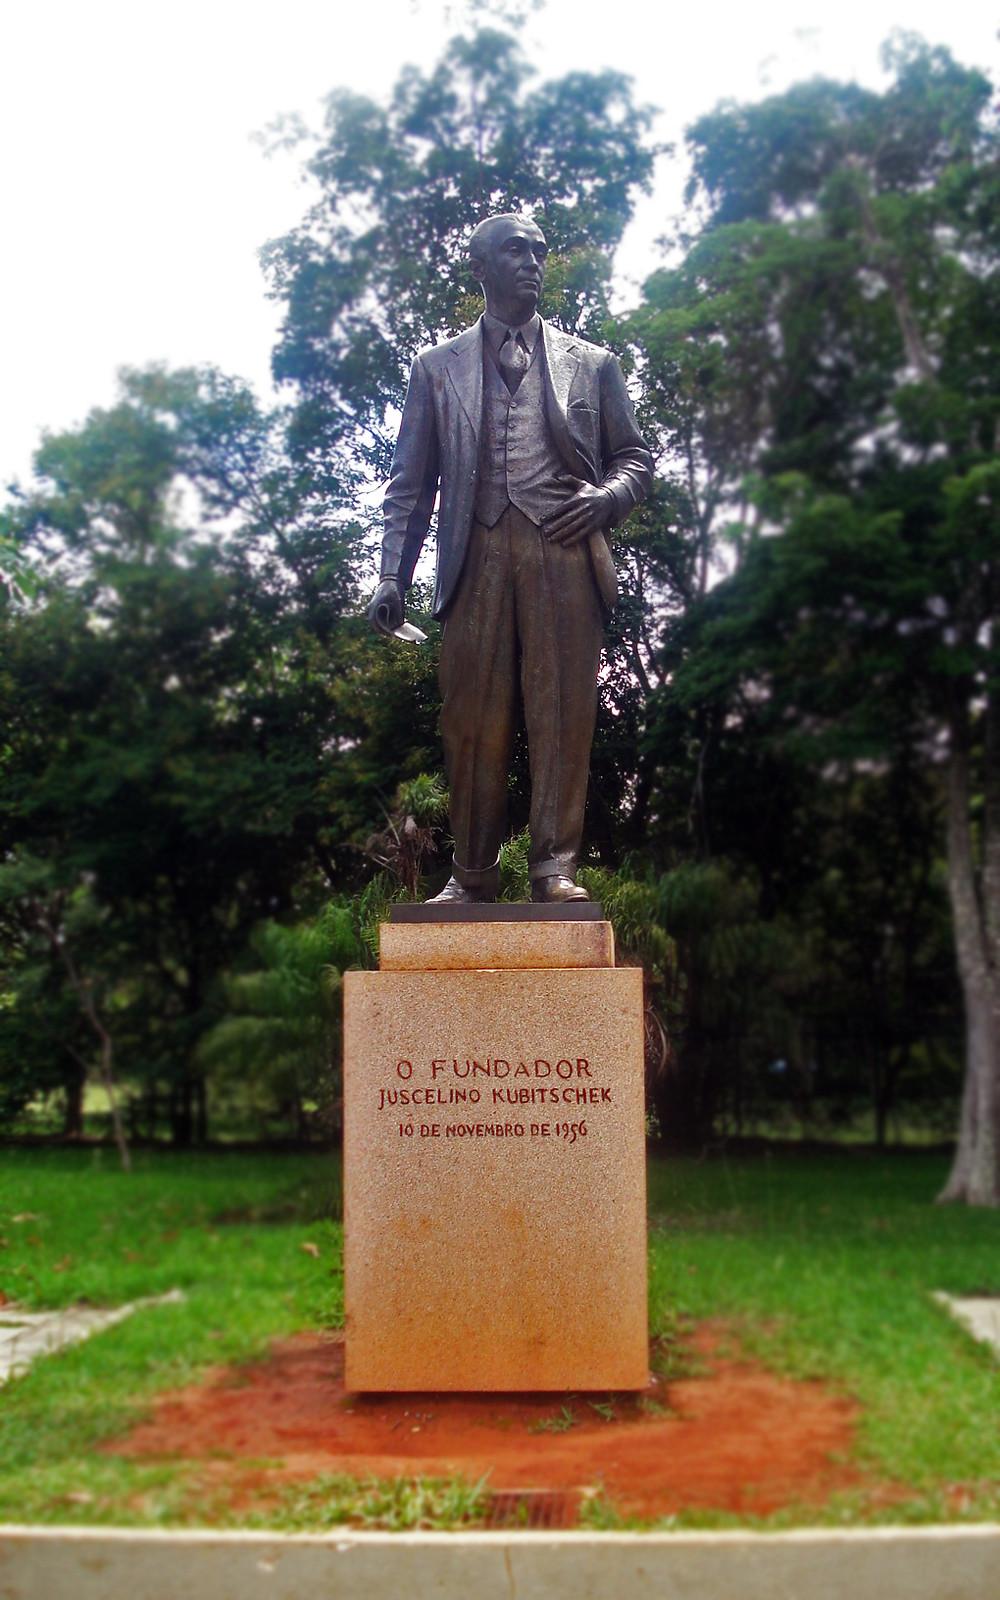 Estátua de Juscelino Kubitschek